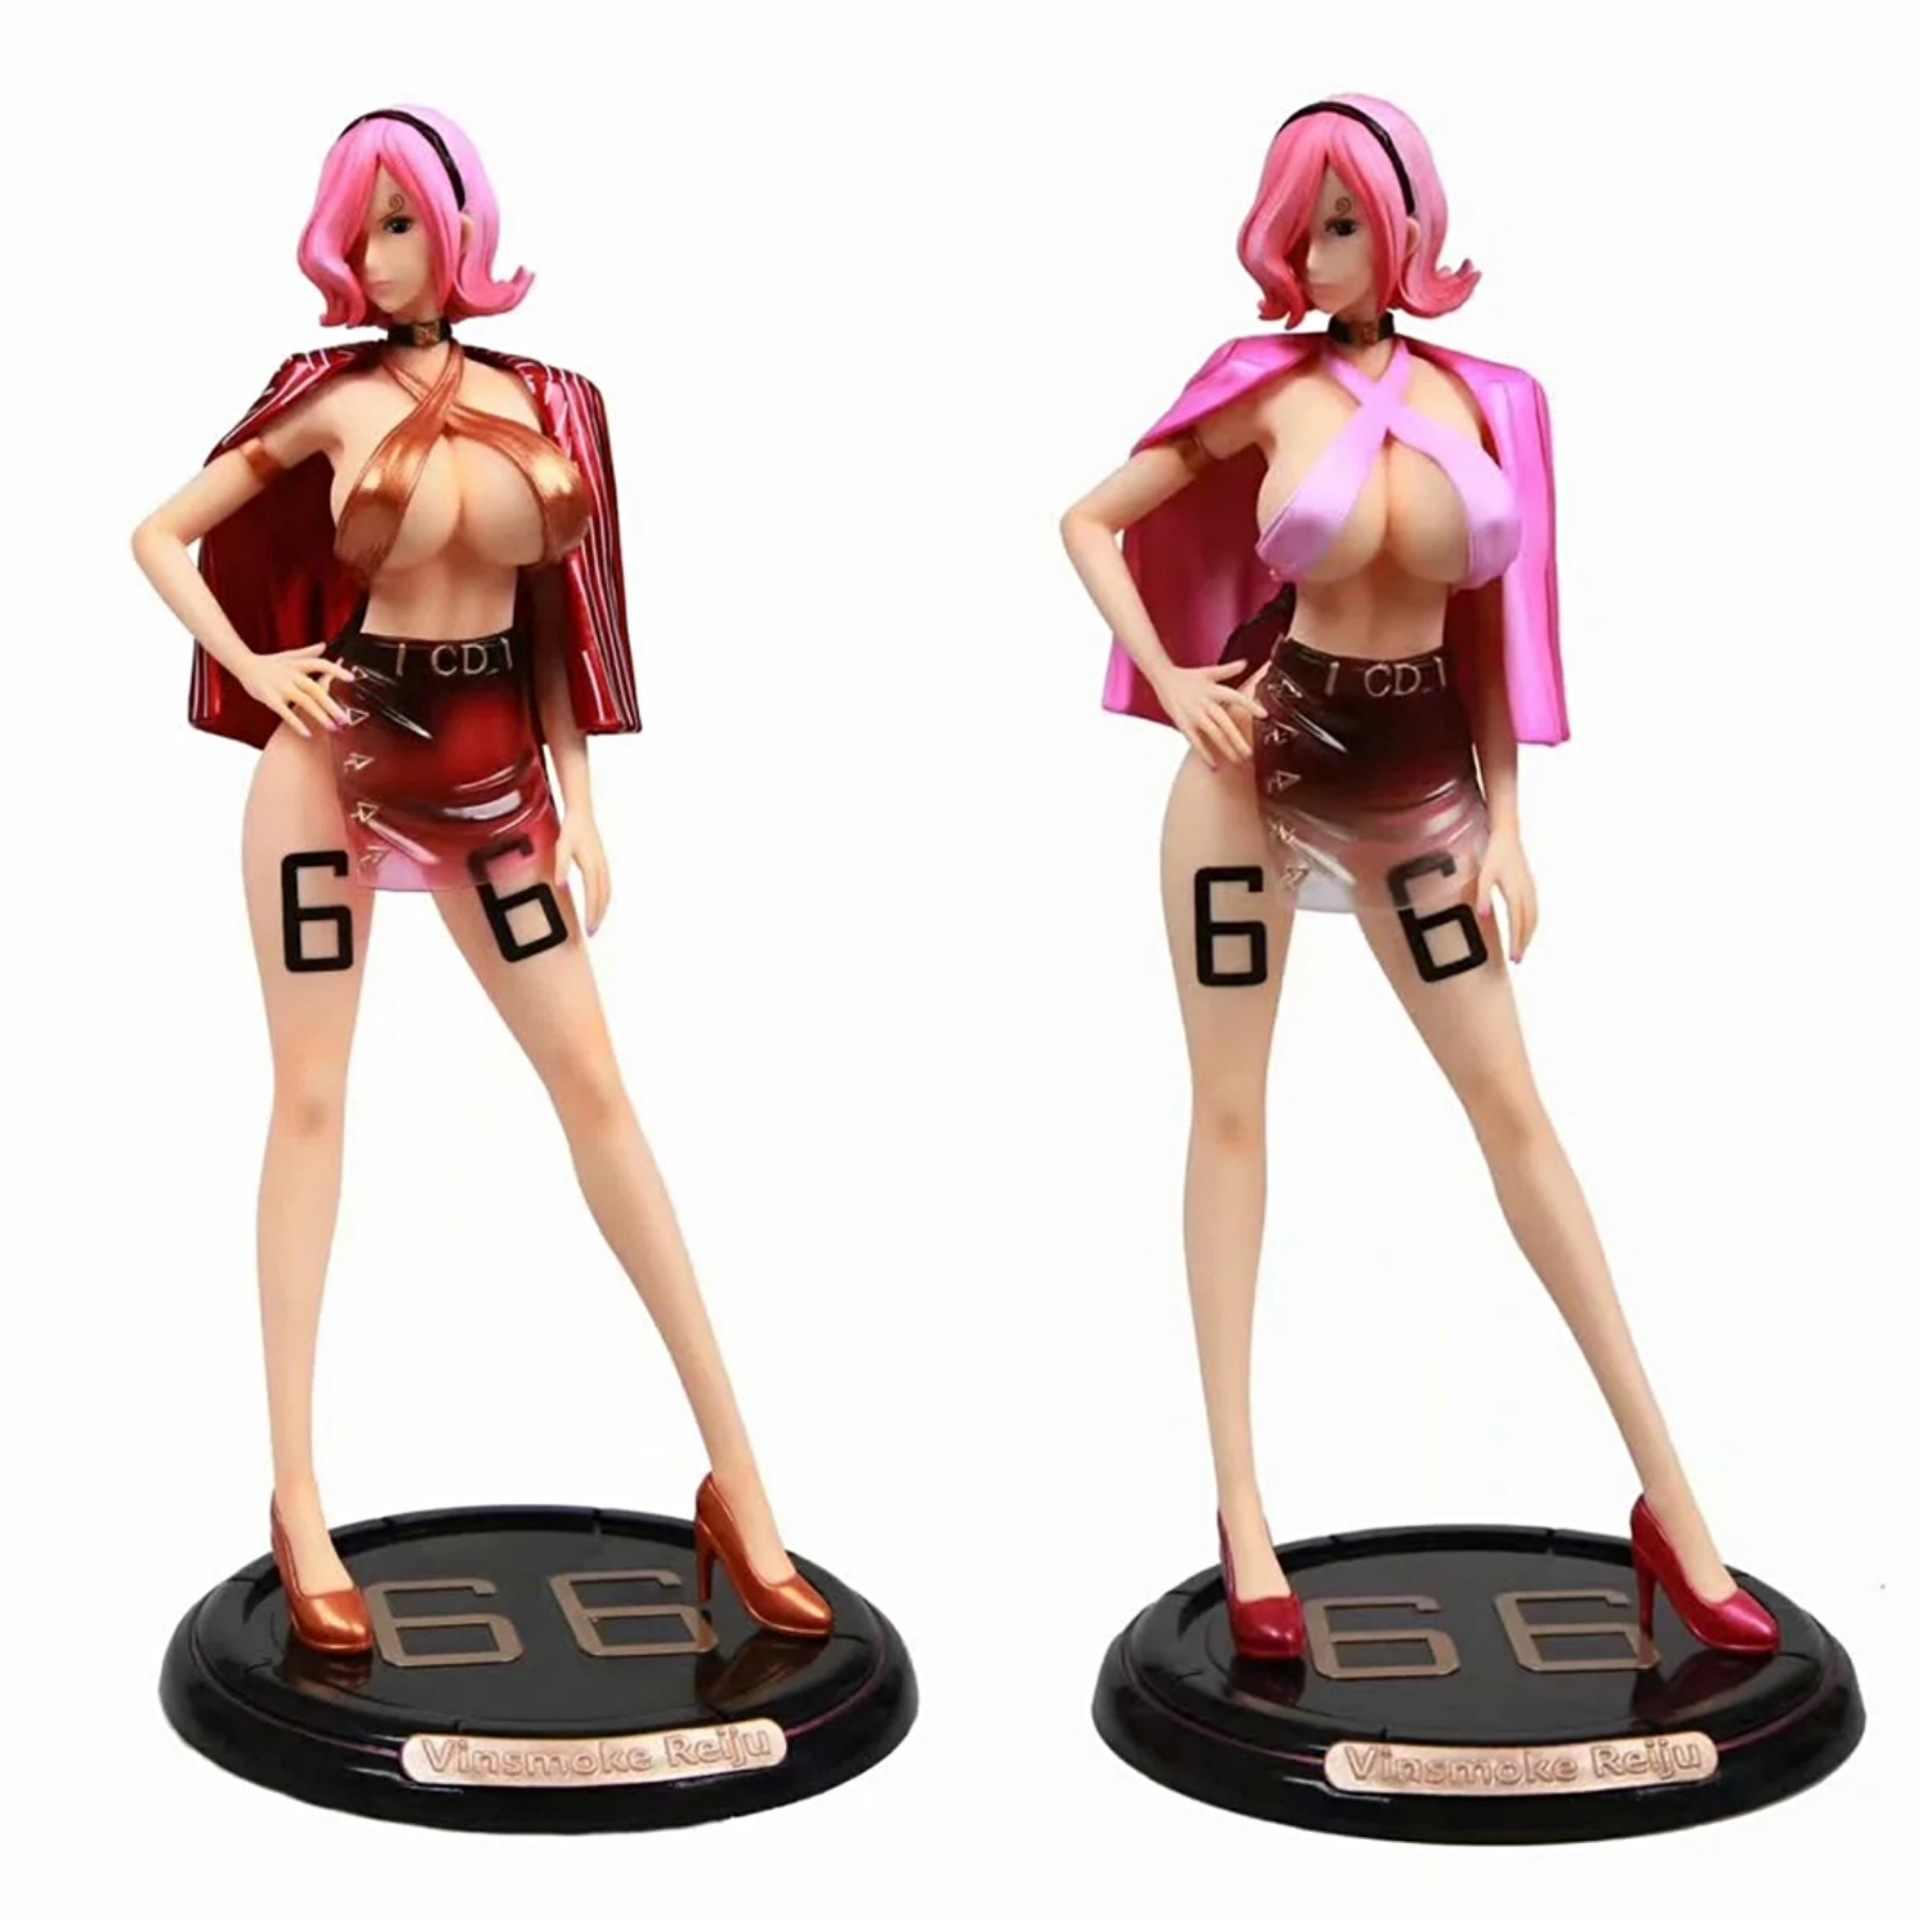 34cm une pièce Vinsmoke Reiju Figure d'anime fille Sexy Reiju PVC figurine jouets Collection modèle poupée cadeau